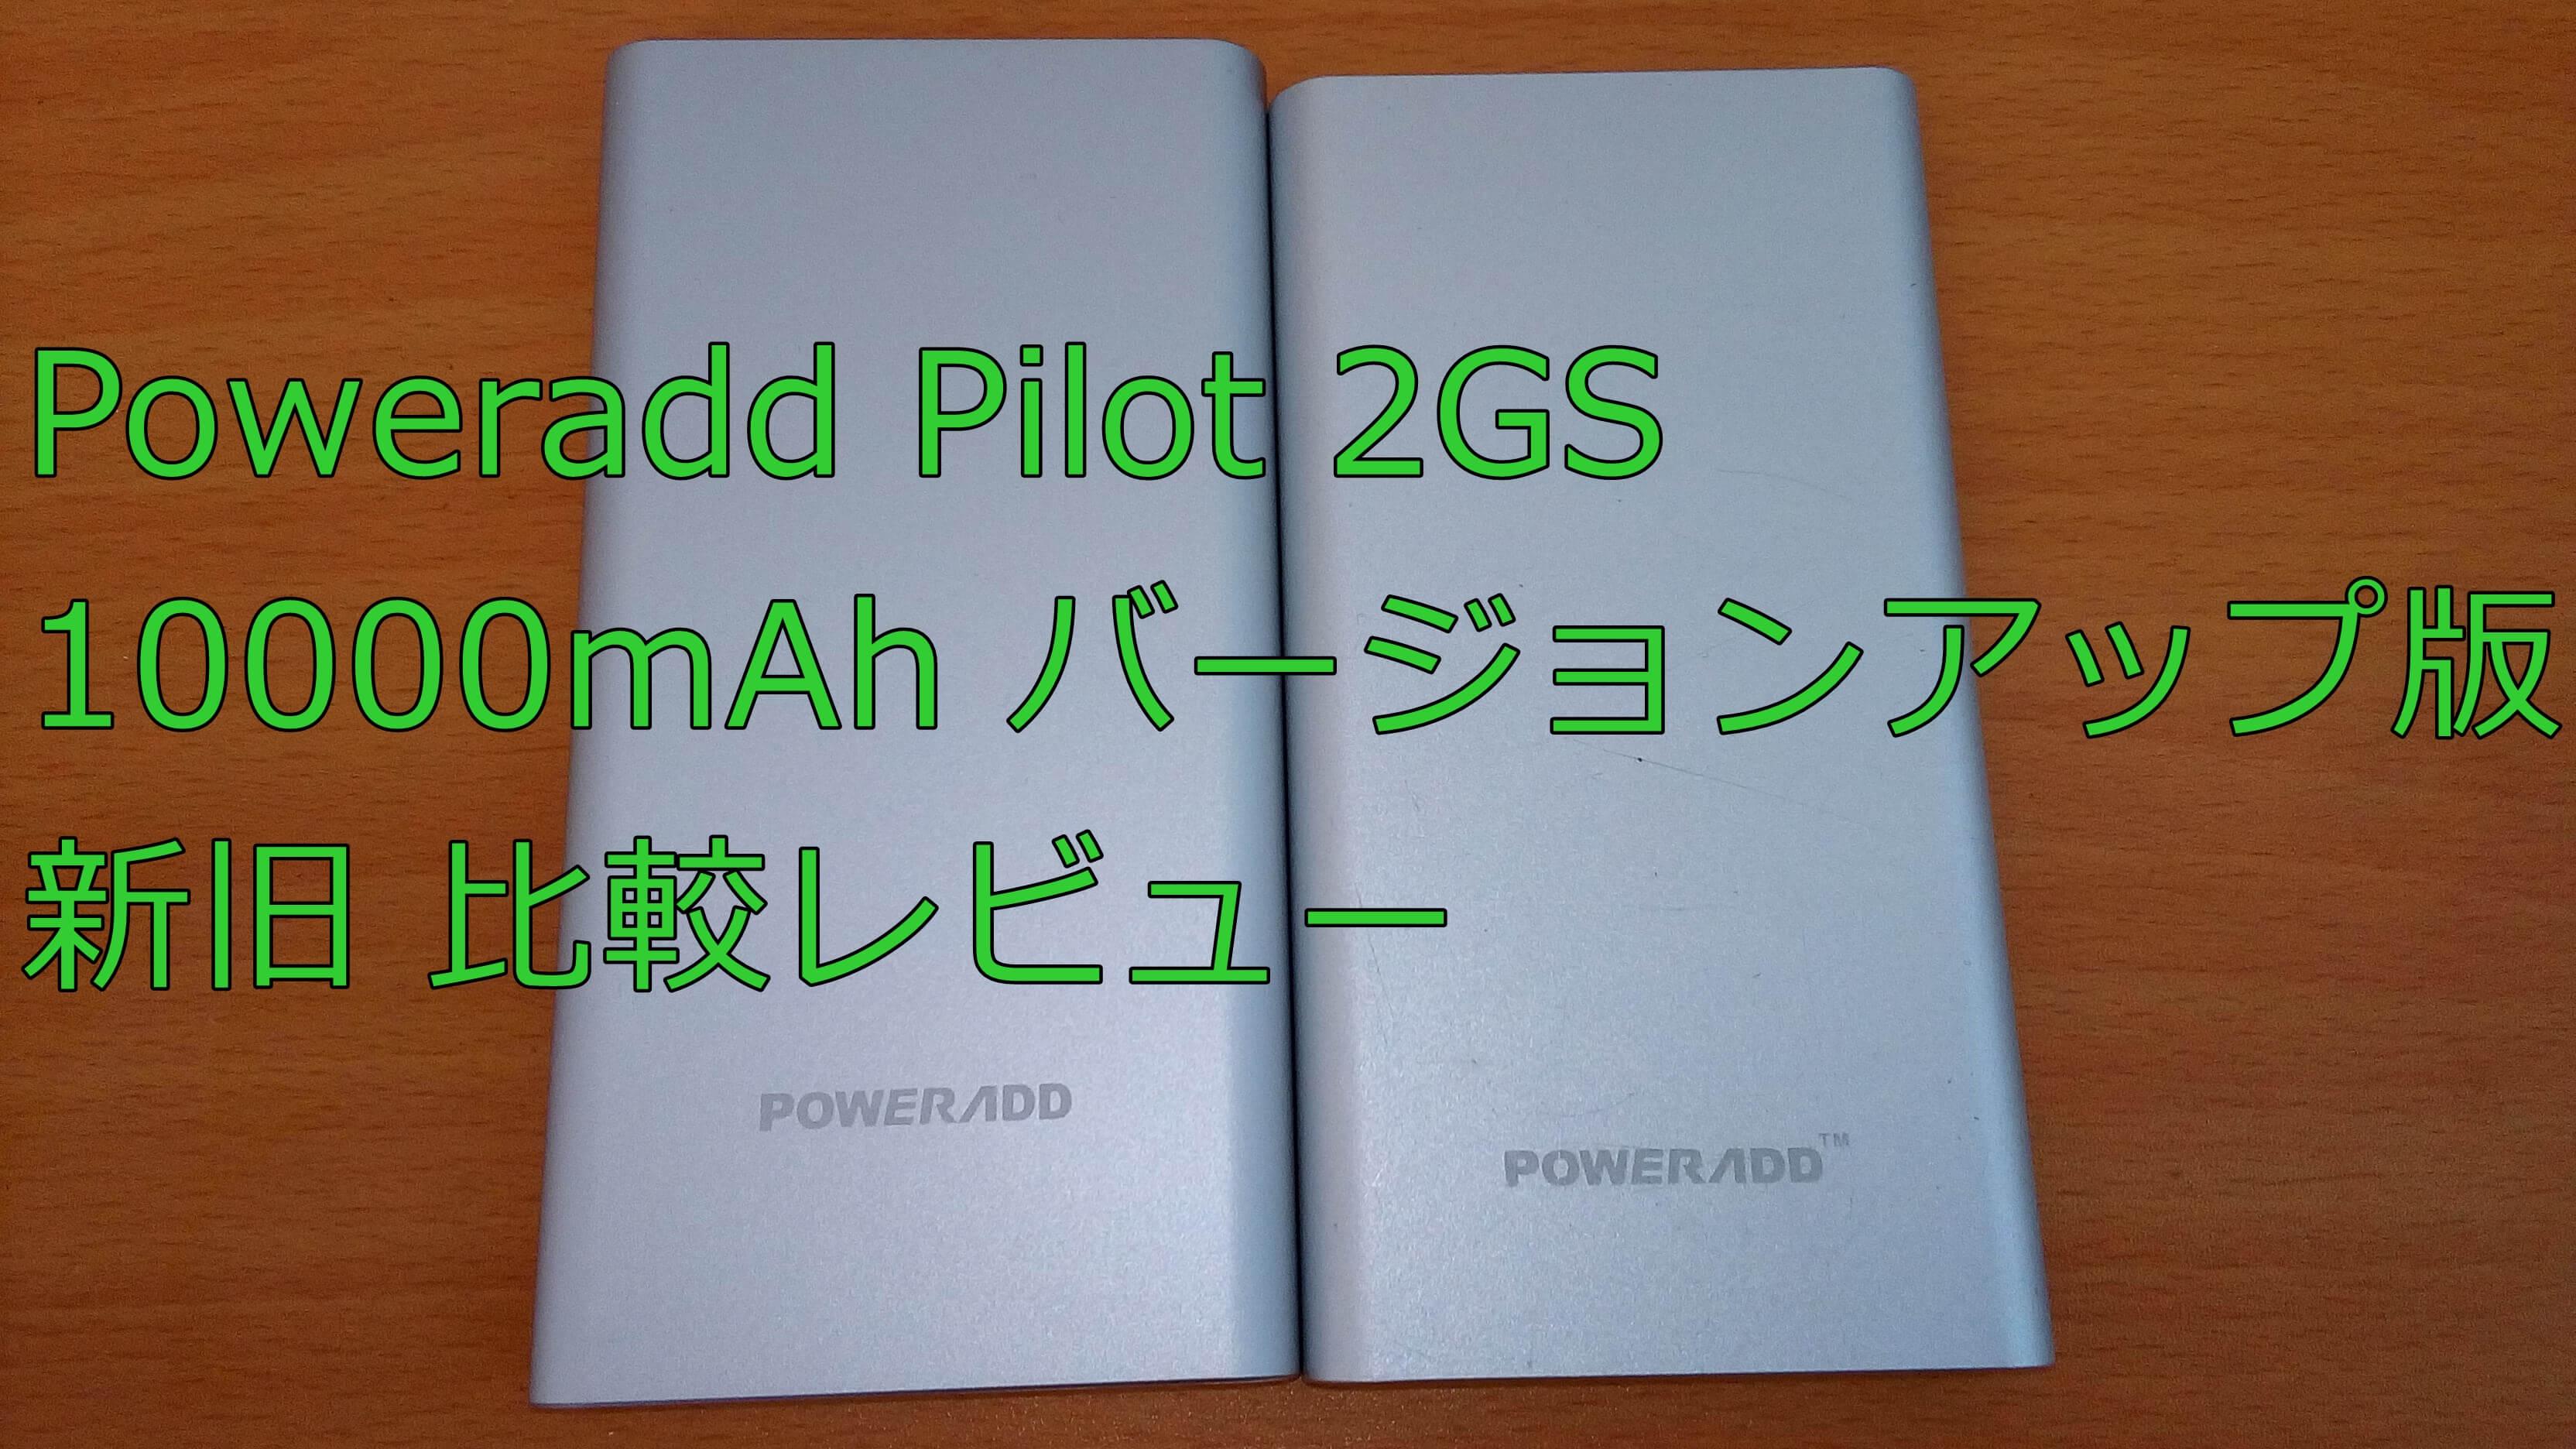 Poweradd Pilot 2GS 10000mAh バージョンアップ版 新旧比較レビュー